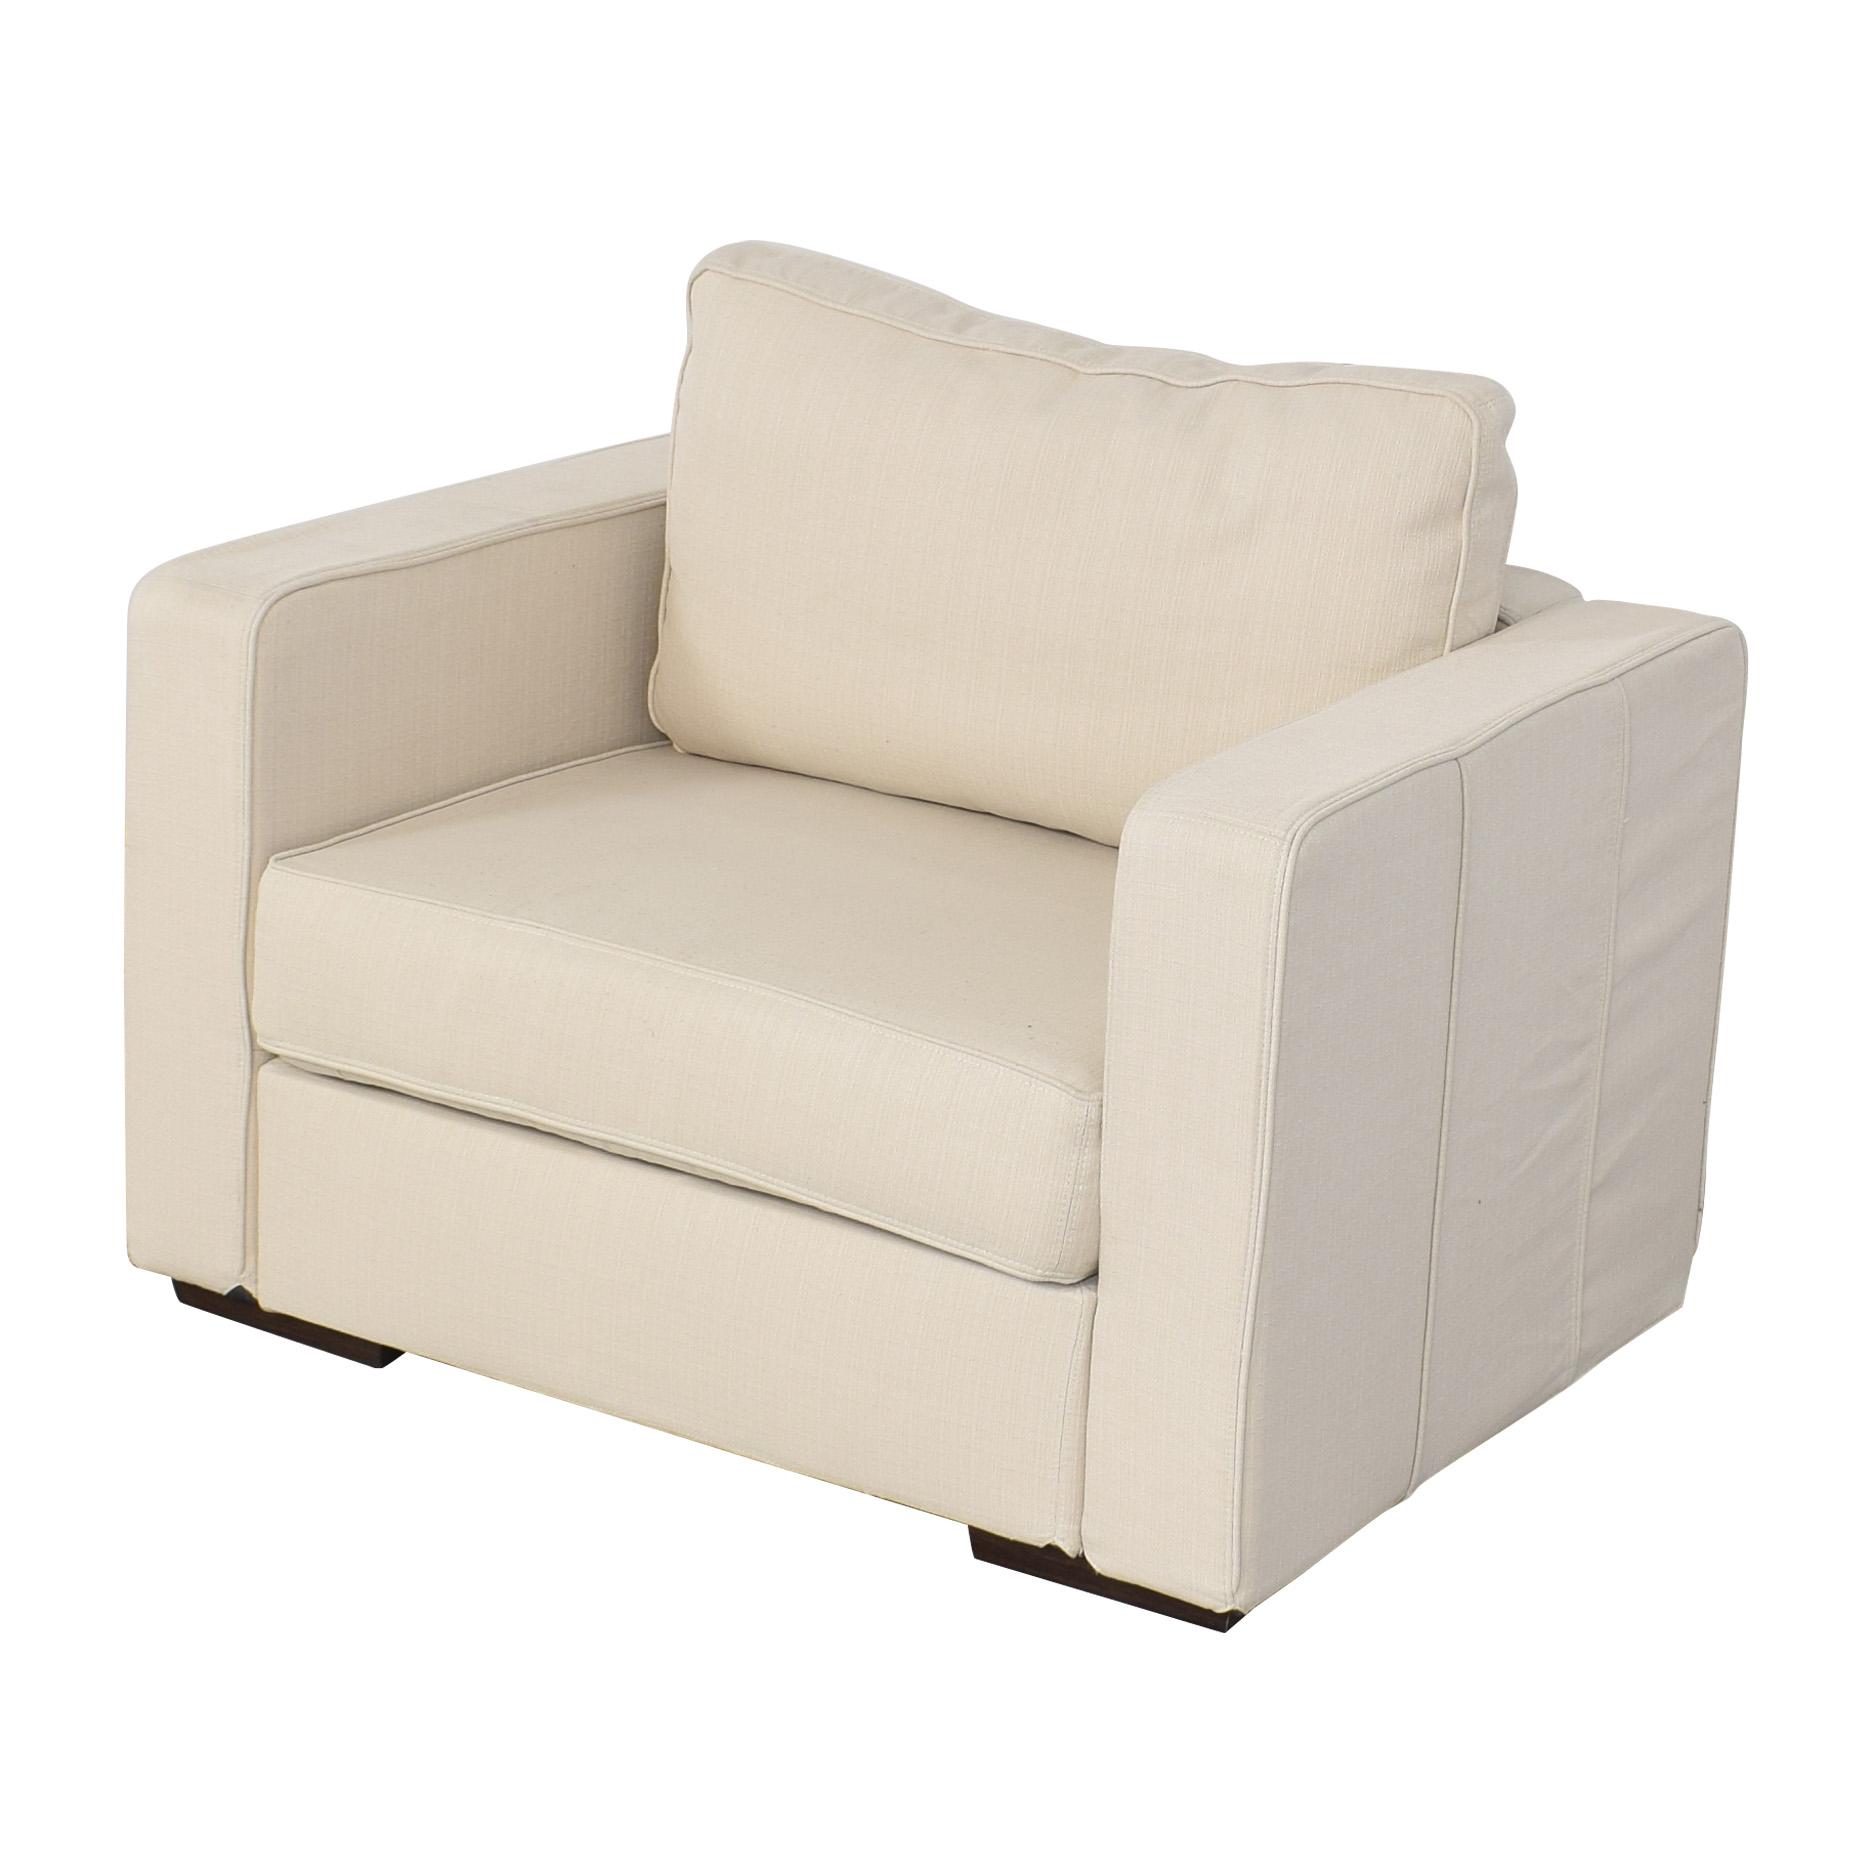 Lovesac Lovesac Single Seat Sactional used